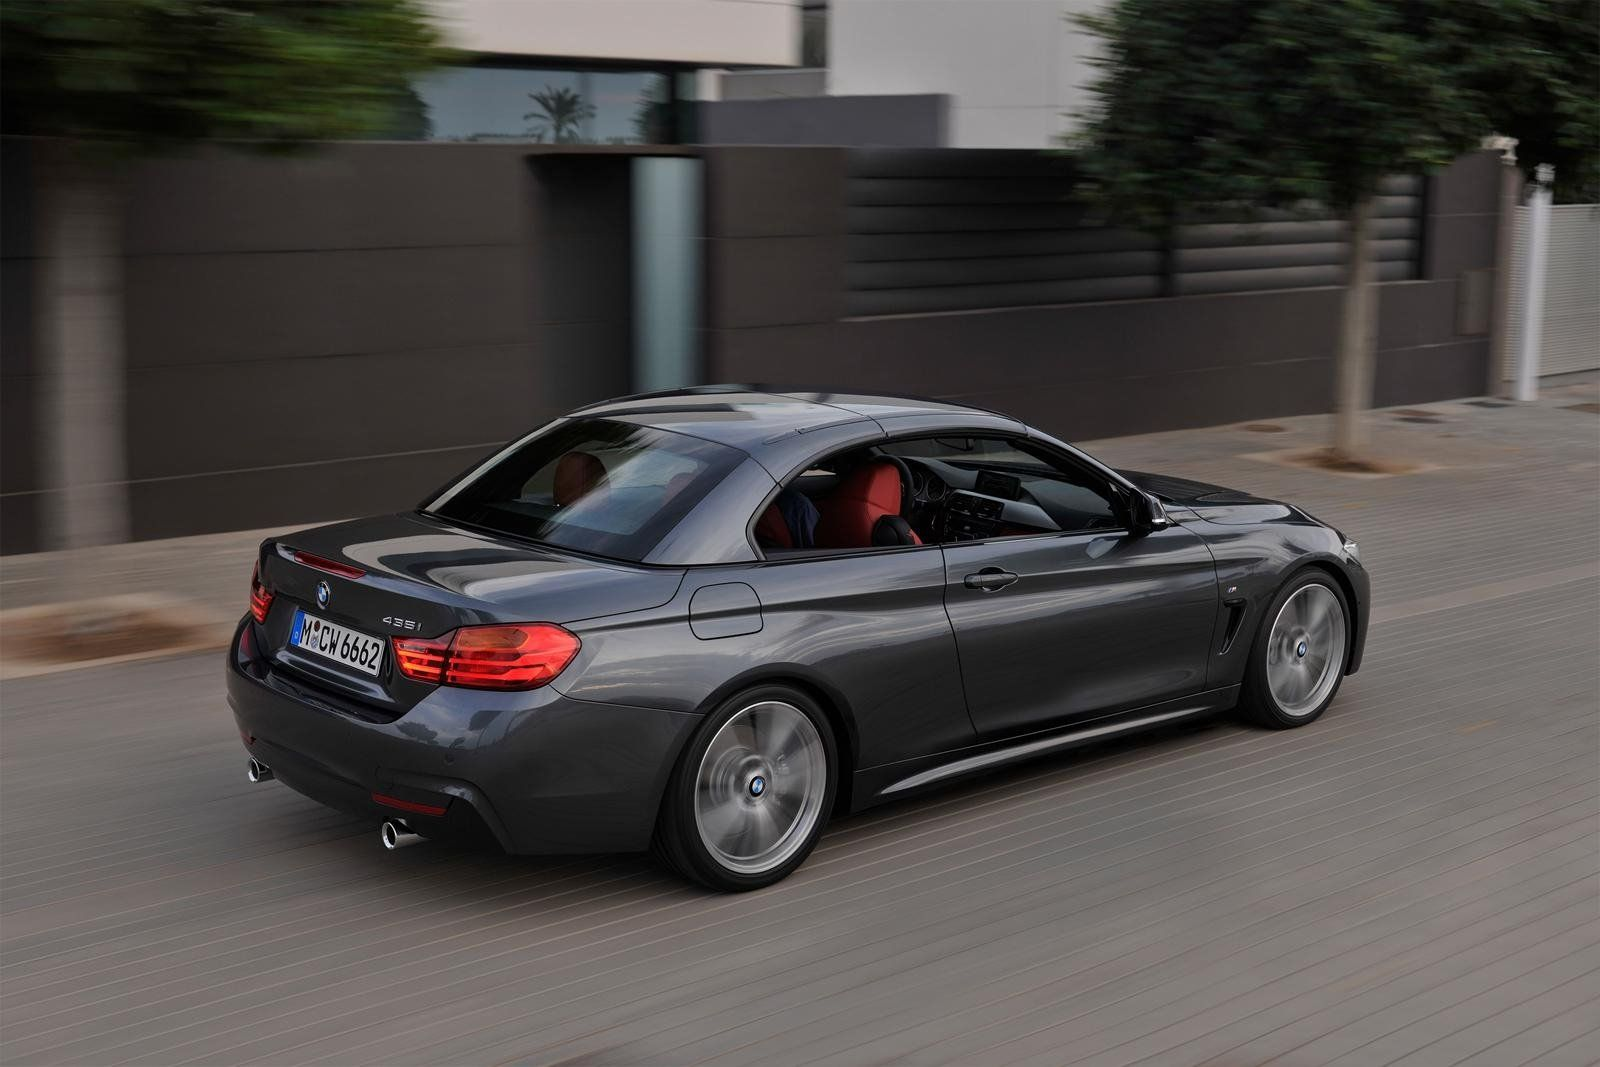 Otsile Abuti Bmw On Twitter In 2020 Motor Bayerische